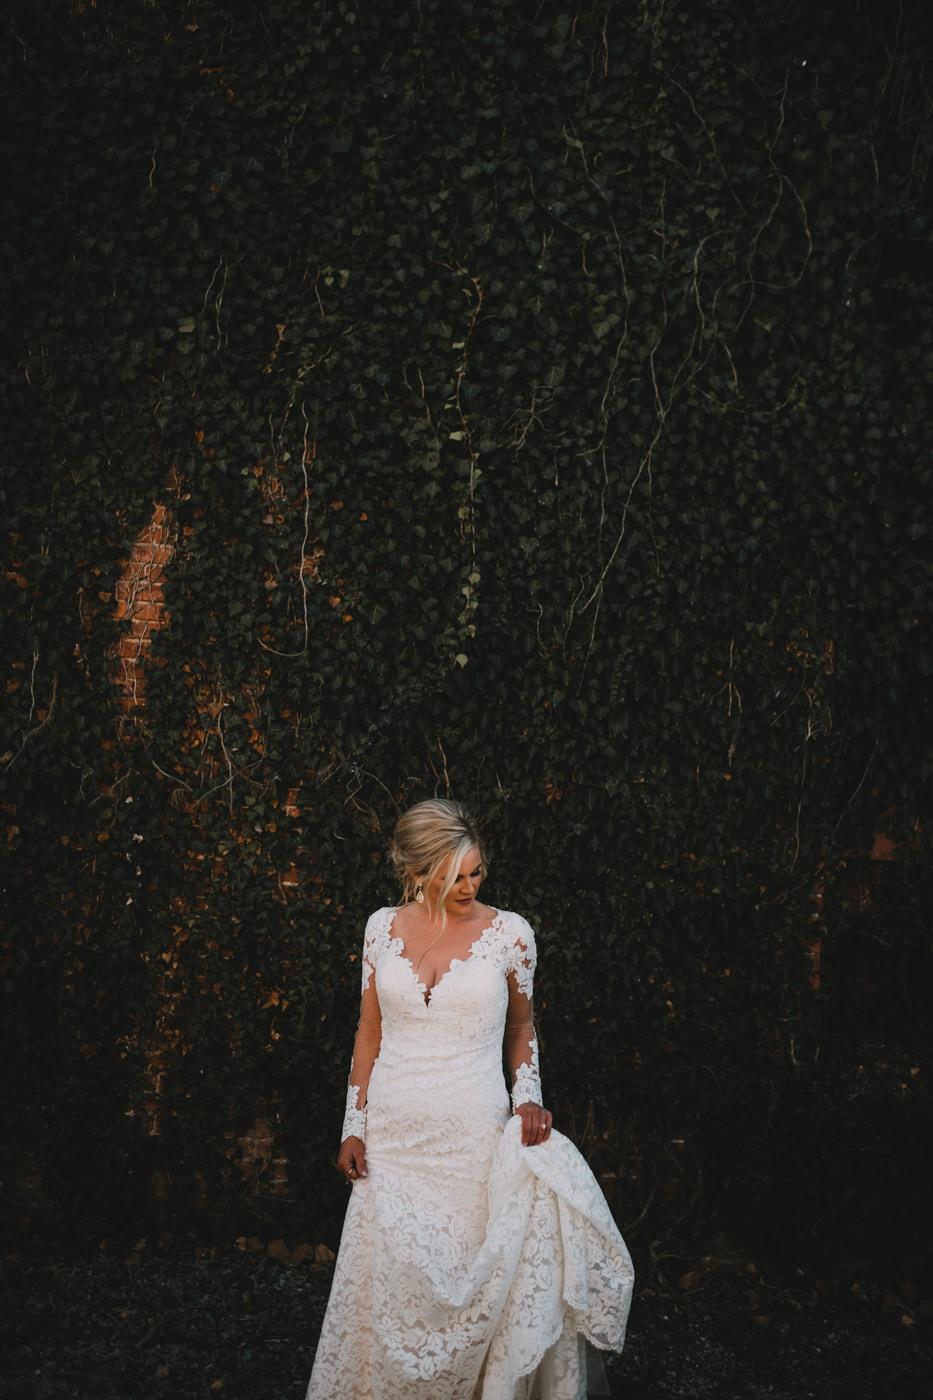 ravington.wedding.northwestarkansas.mileswittboyer-19.jpg